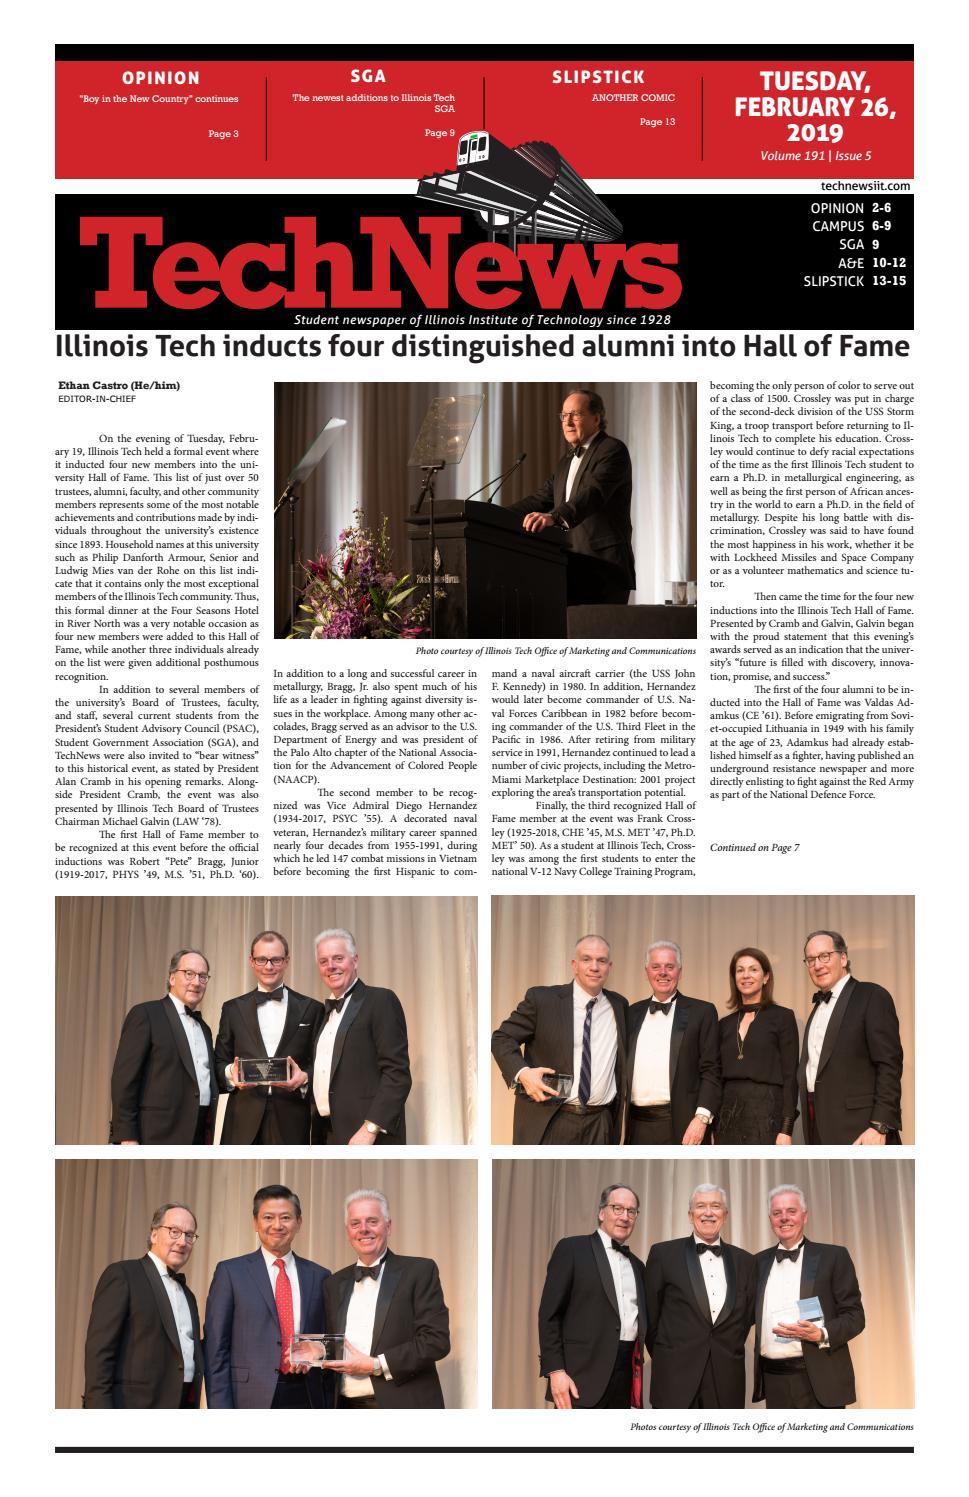 Volume 191 Issue 5 by TechNews - issuu